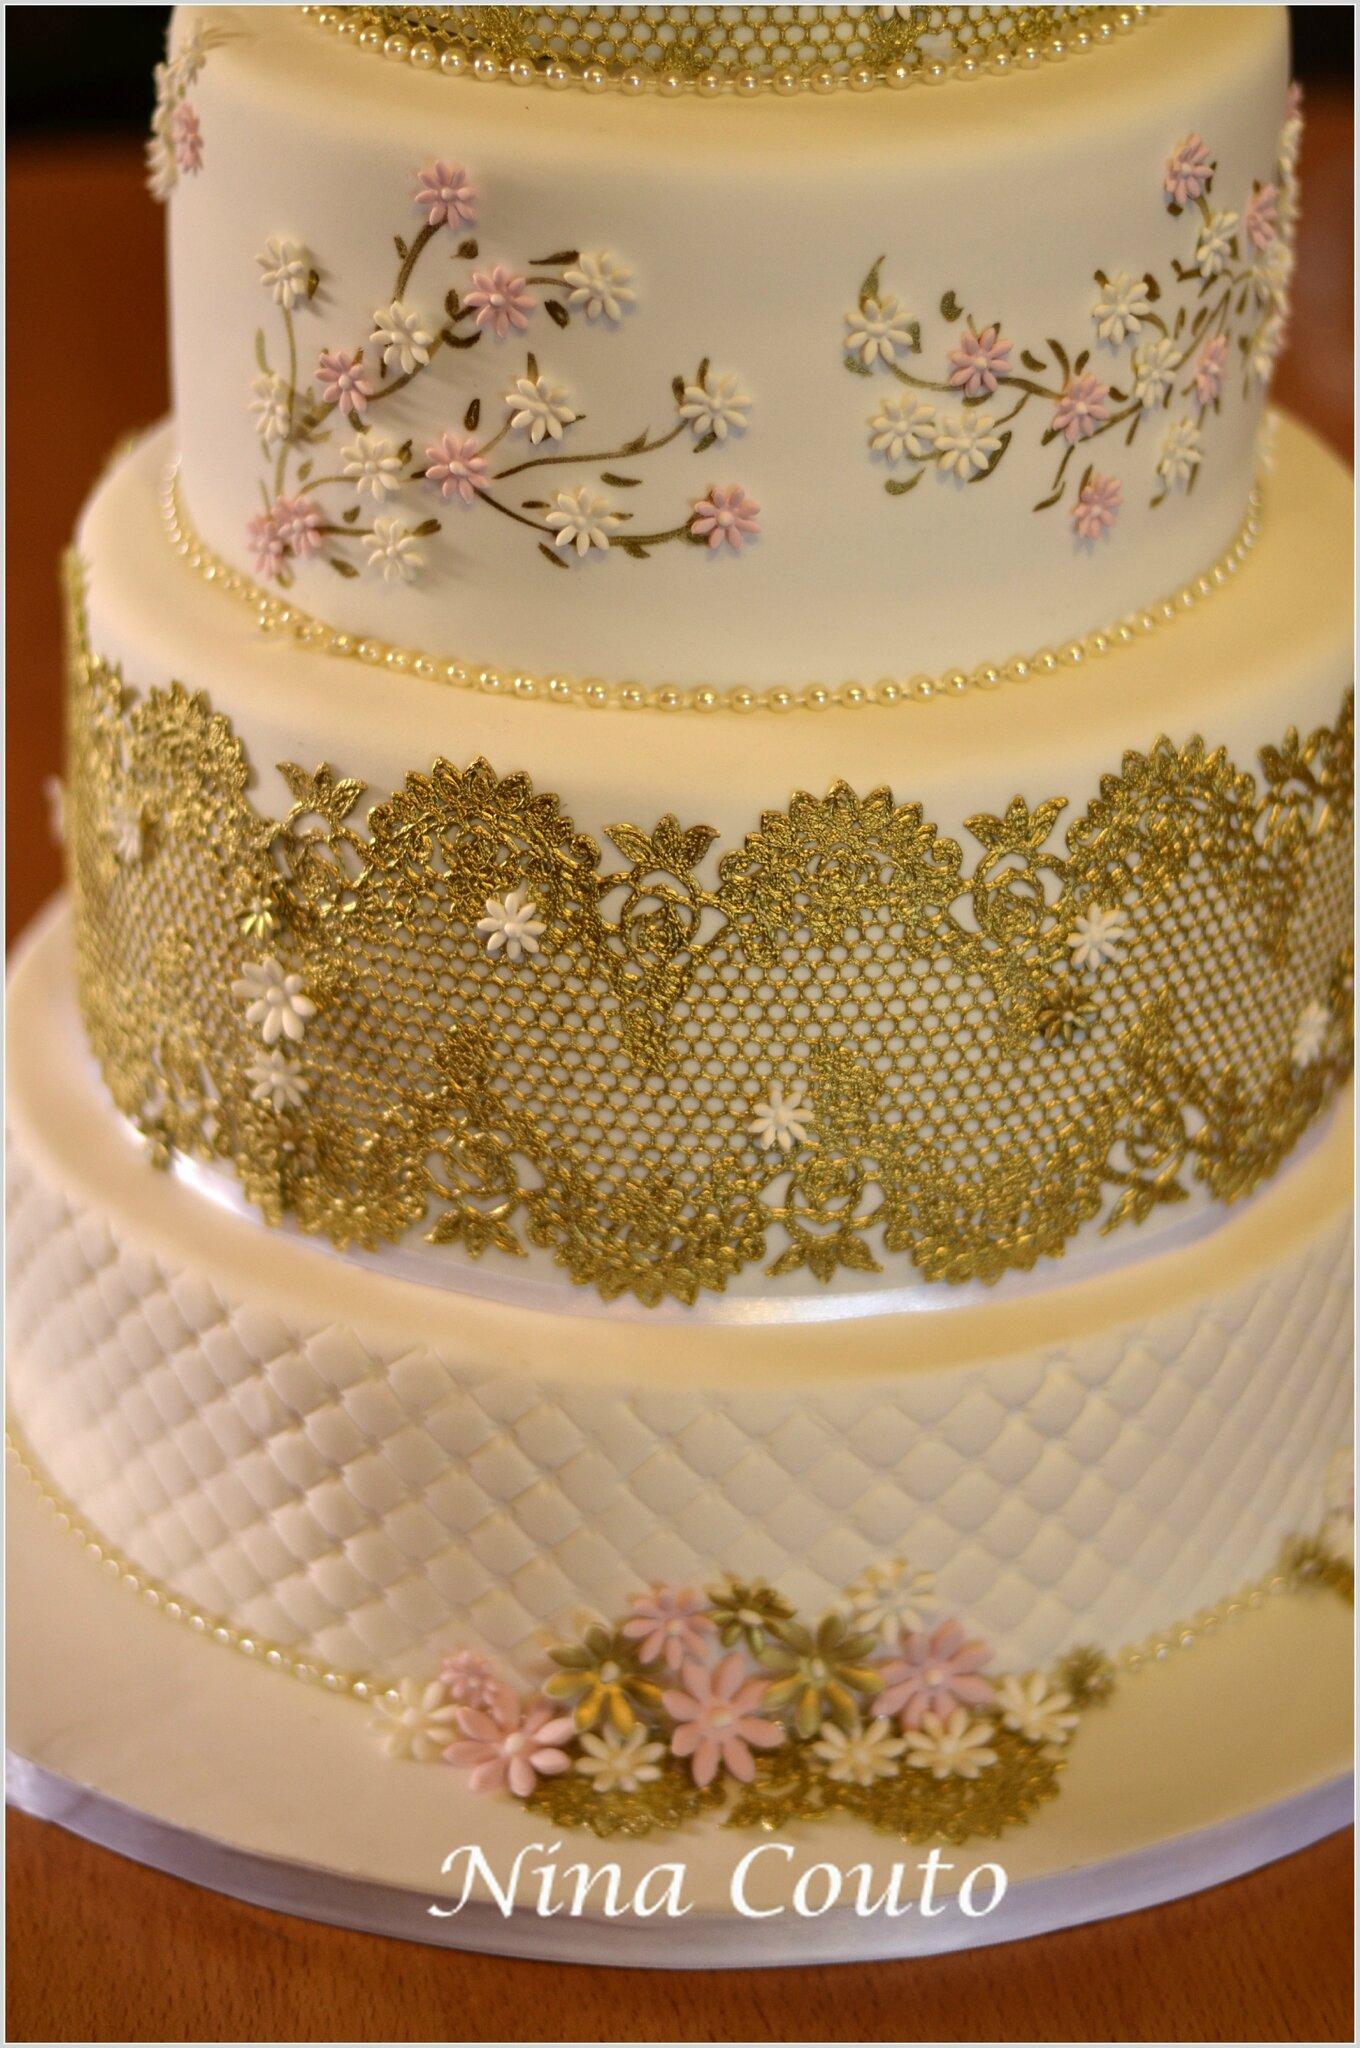 gateau mariage blanc doré nina couto 2